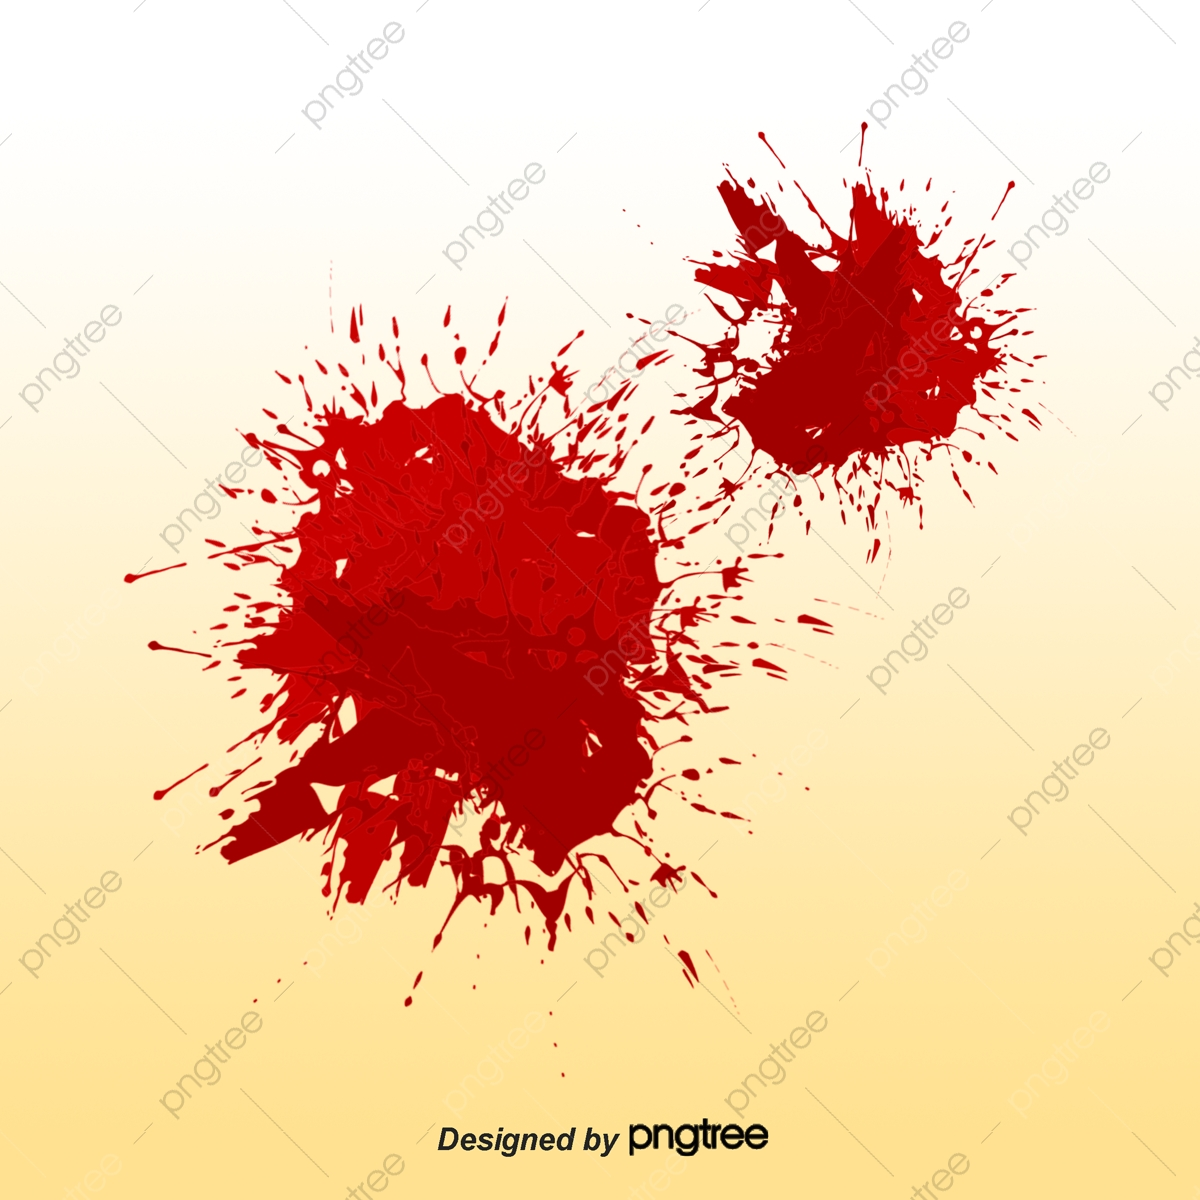 Hand Painted Little Dark Blood, Hand Vector, Blood Vector